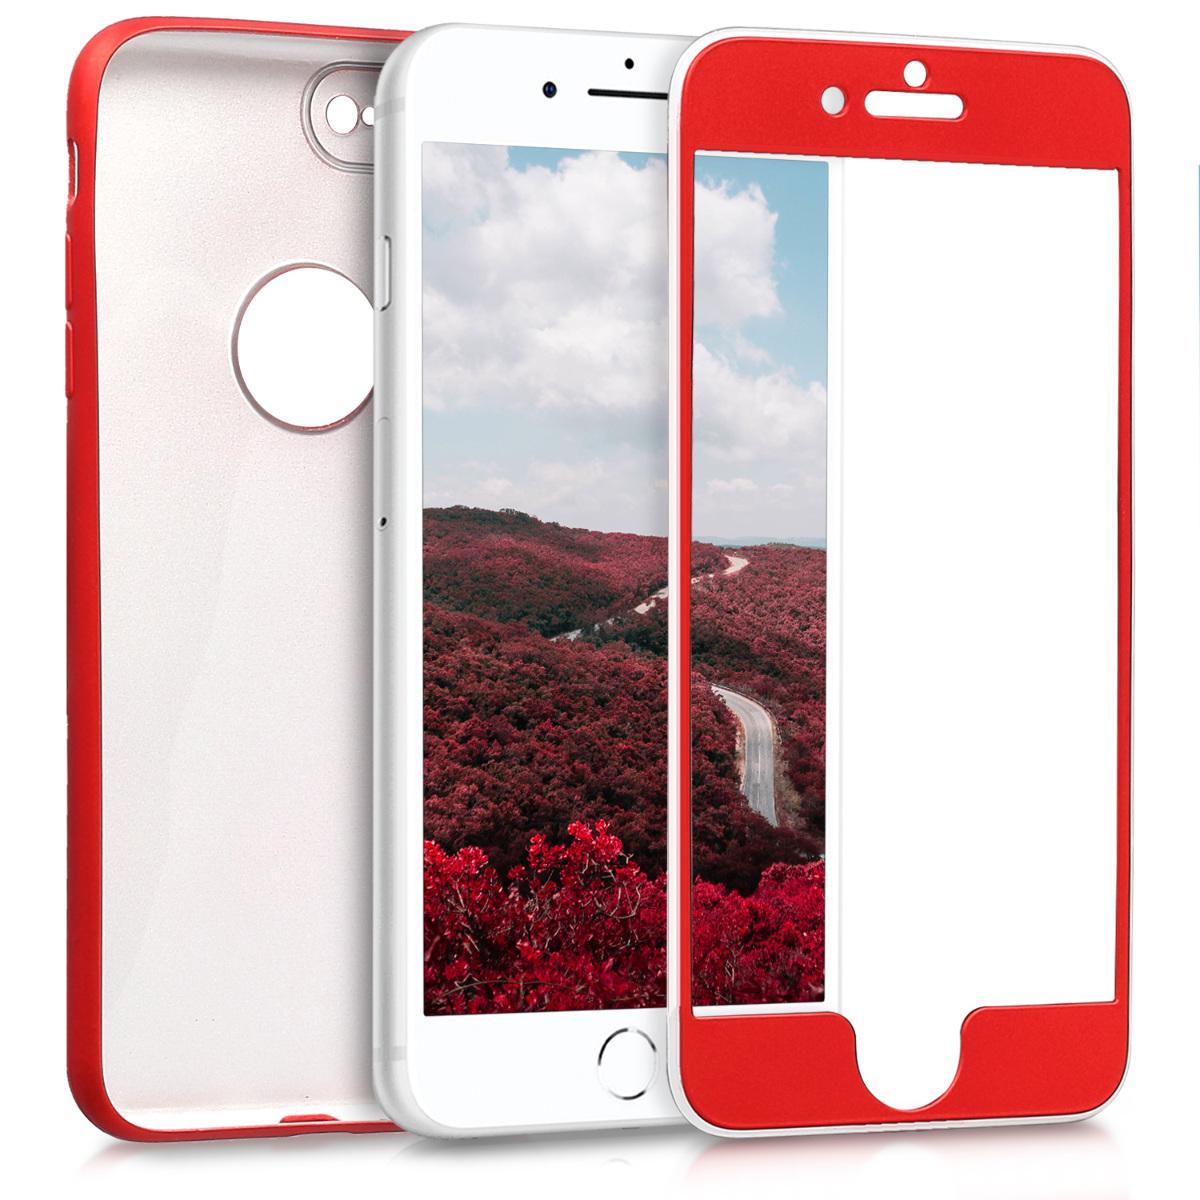 KW Θήκη Full Body iPhone 8 Plus - Metallic Dark Red (43478.36)